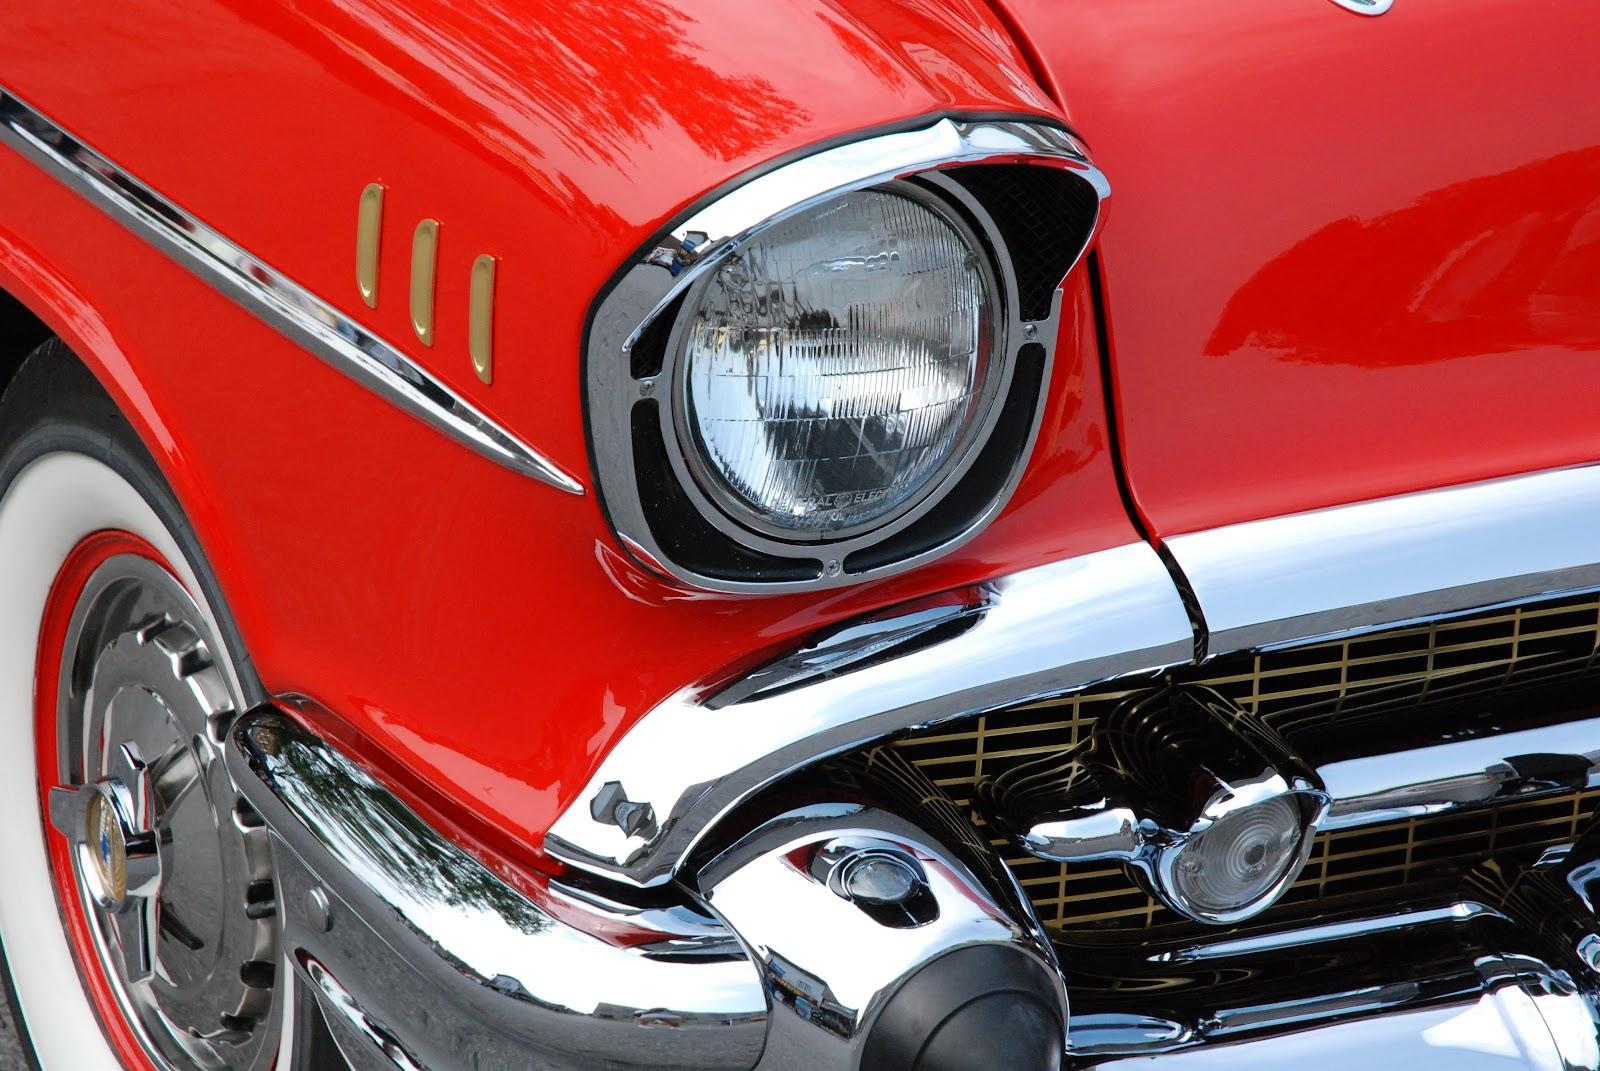 classic-car-76423.jpg